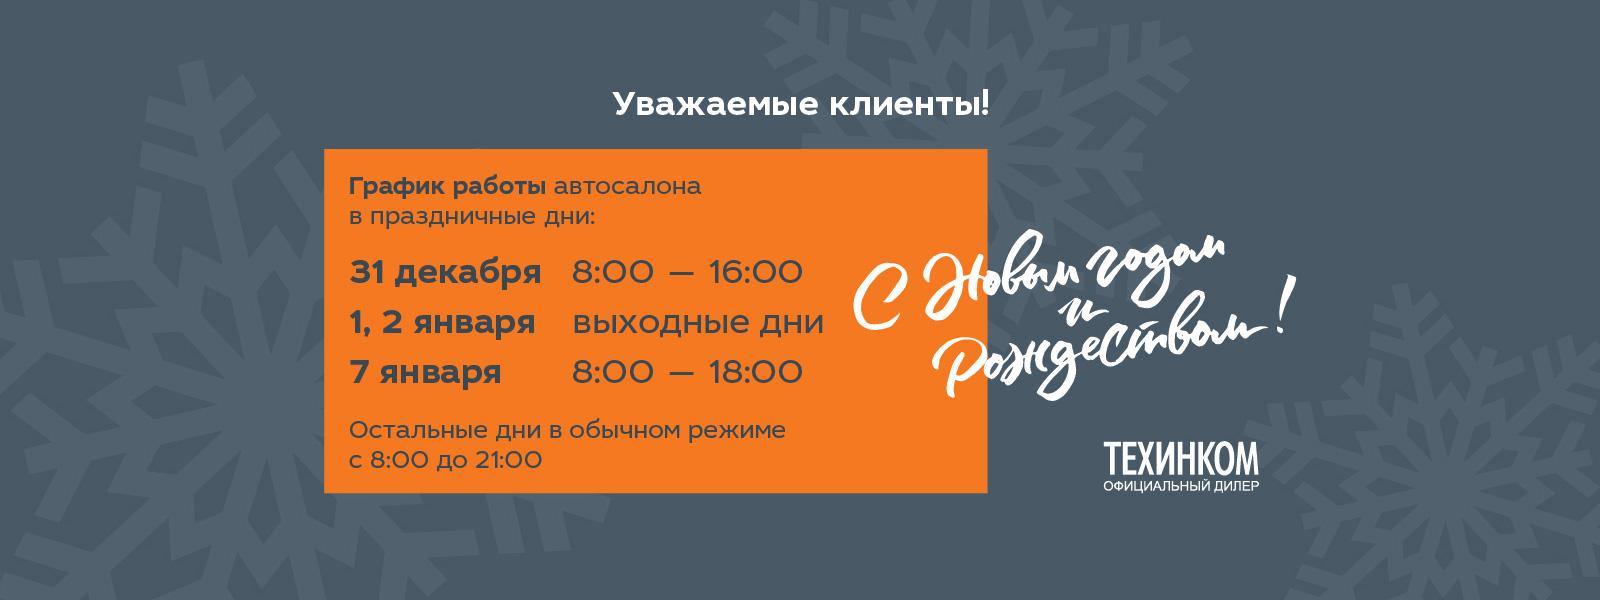 Акции и предложения от автосалонов в москве аренда авто газель в москве без залога